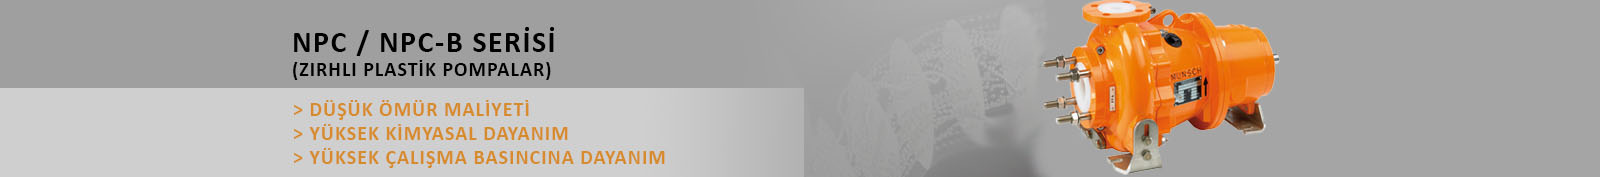 NPC/NPC-B Serisi Metal Kaplı Yatay Plastik Asit Pompası